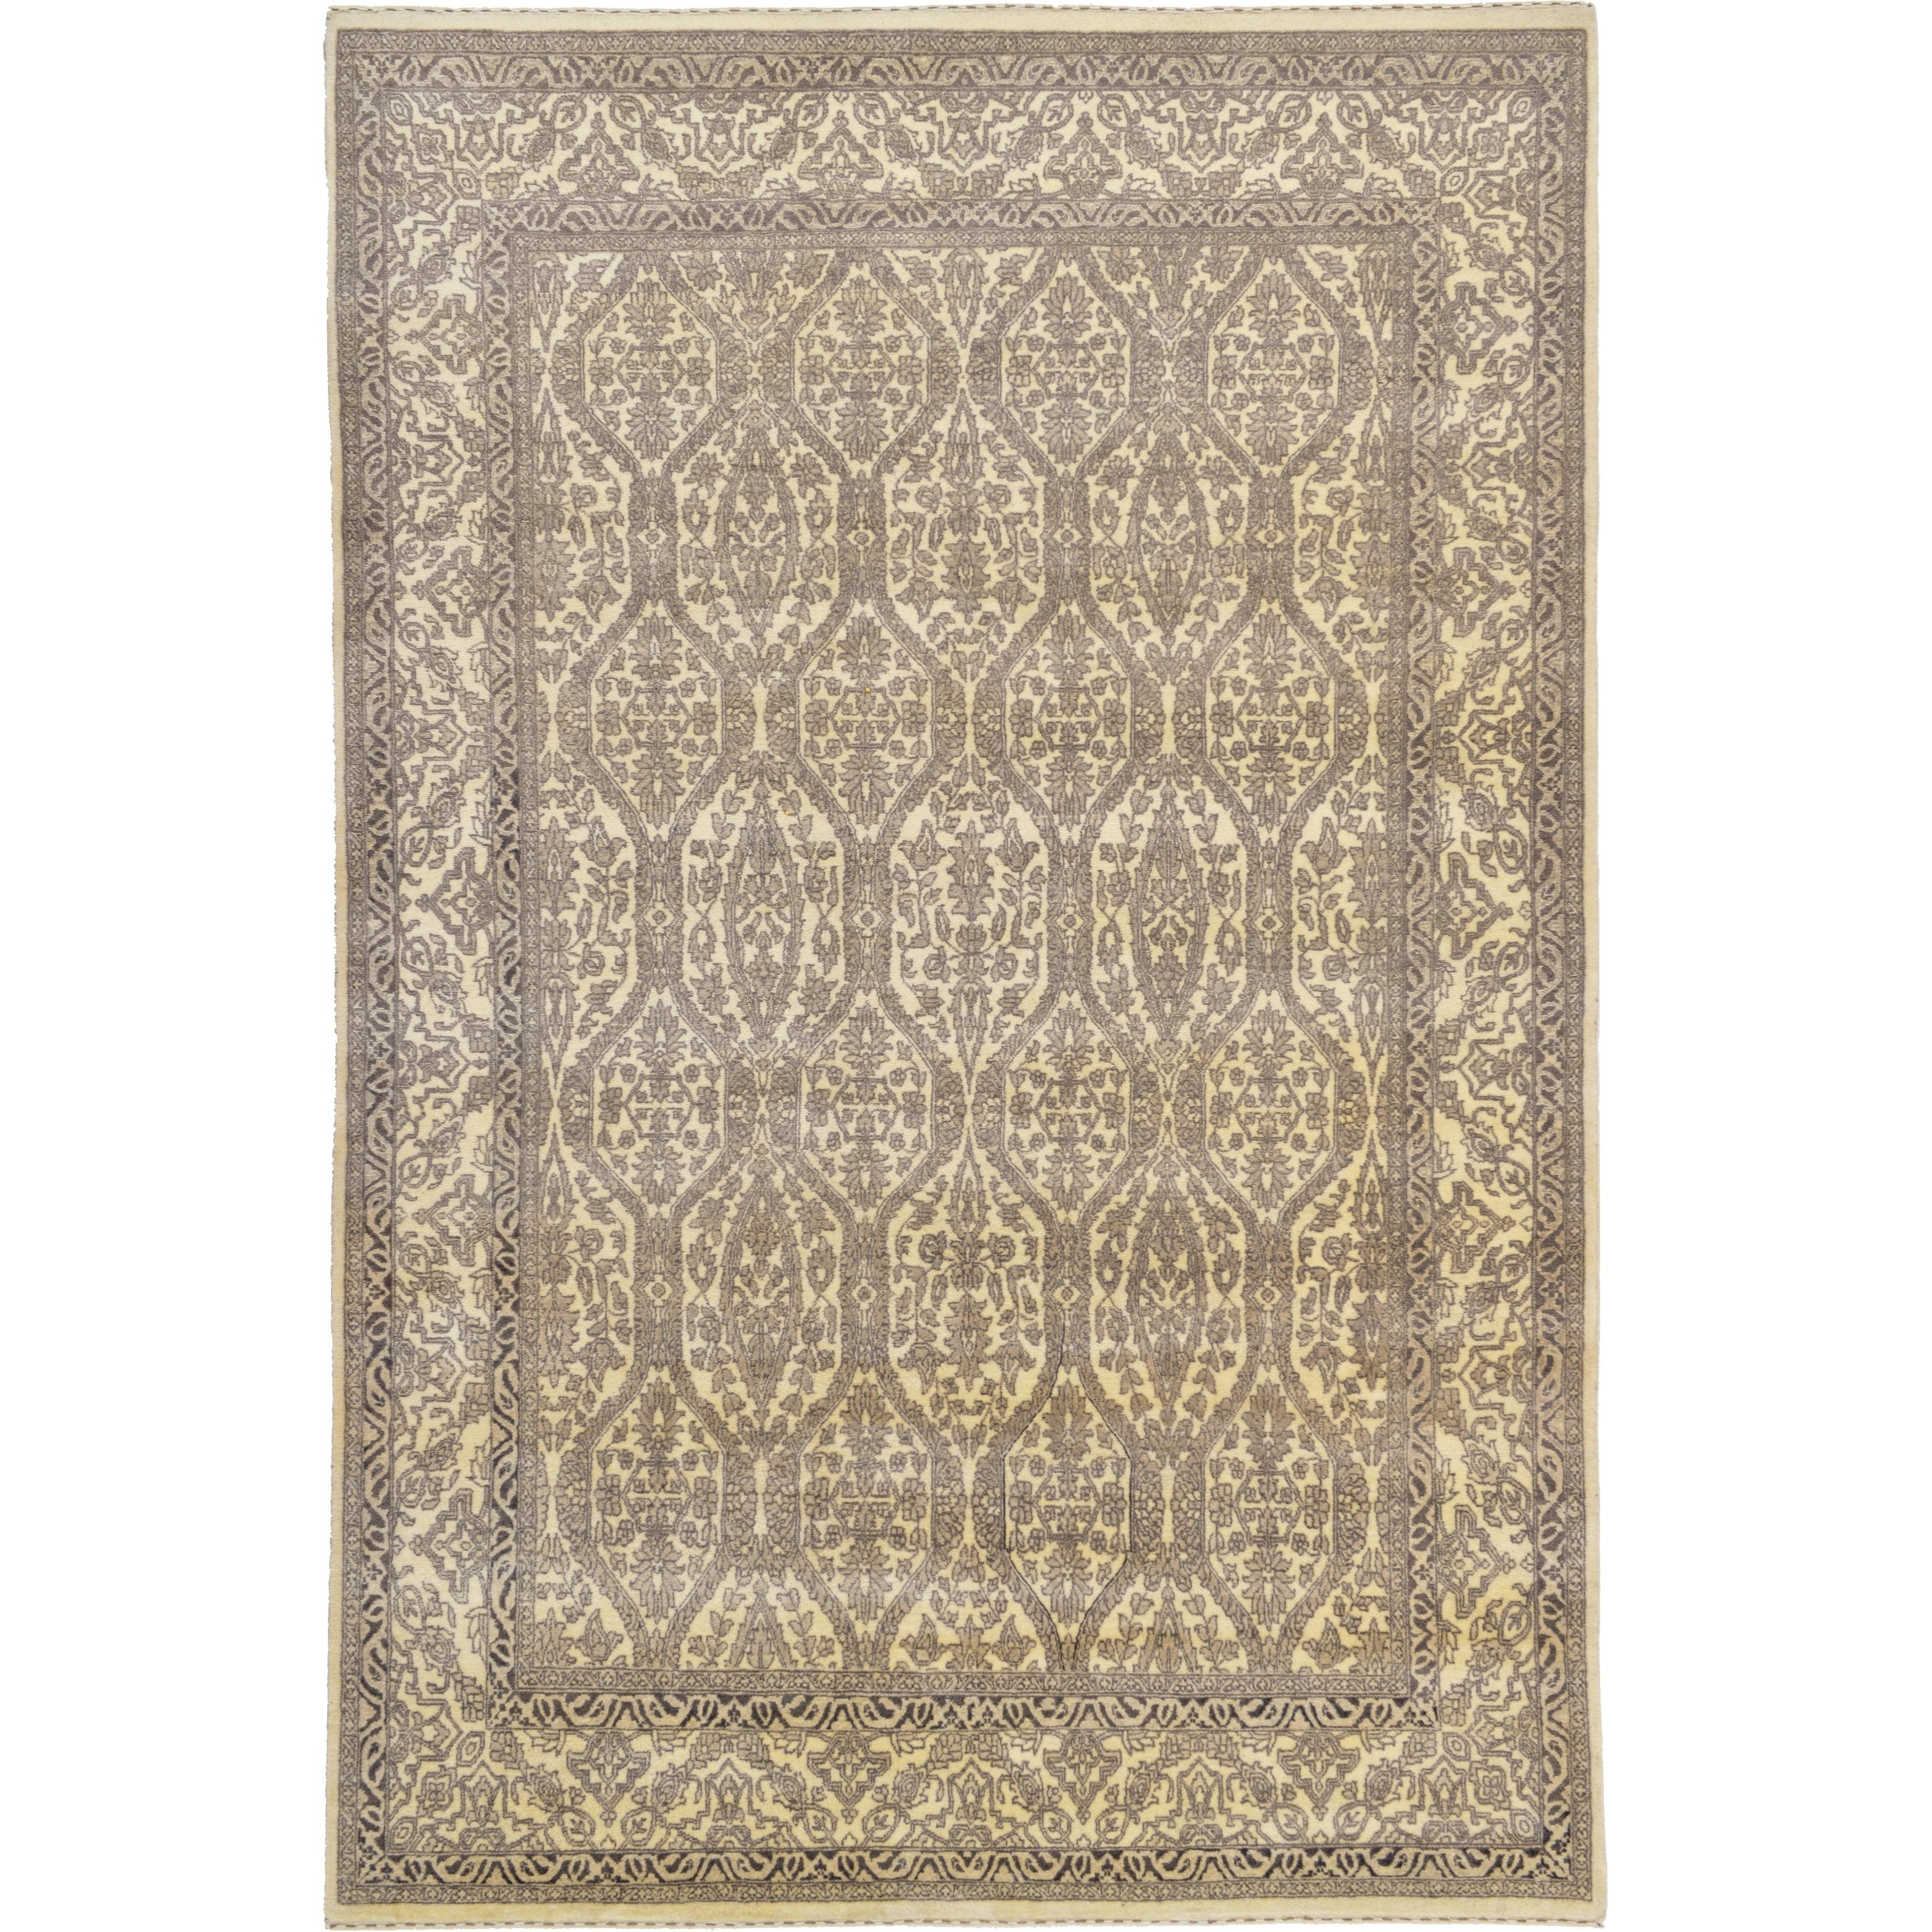 Hand Knotted Kashkuli Gabbeh Wool Area Rug - 6 8 x 10 1 (Cream - 6 8 x 10 1)